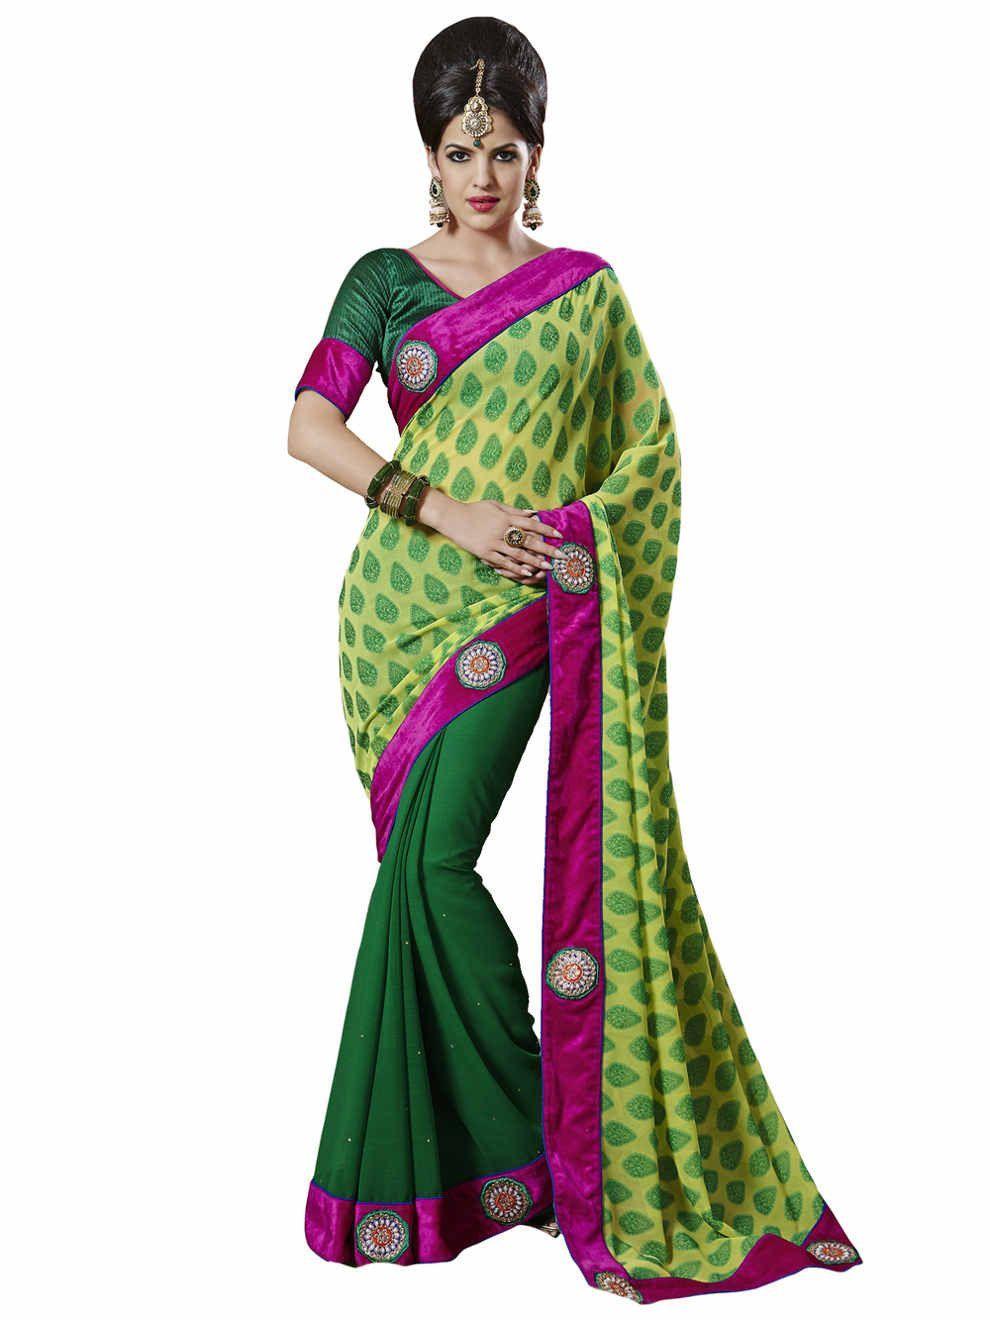 Melluha sensious green chiffon designer saree products